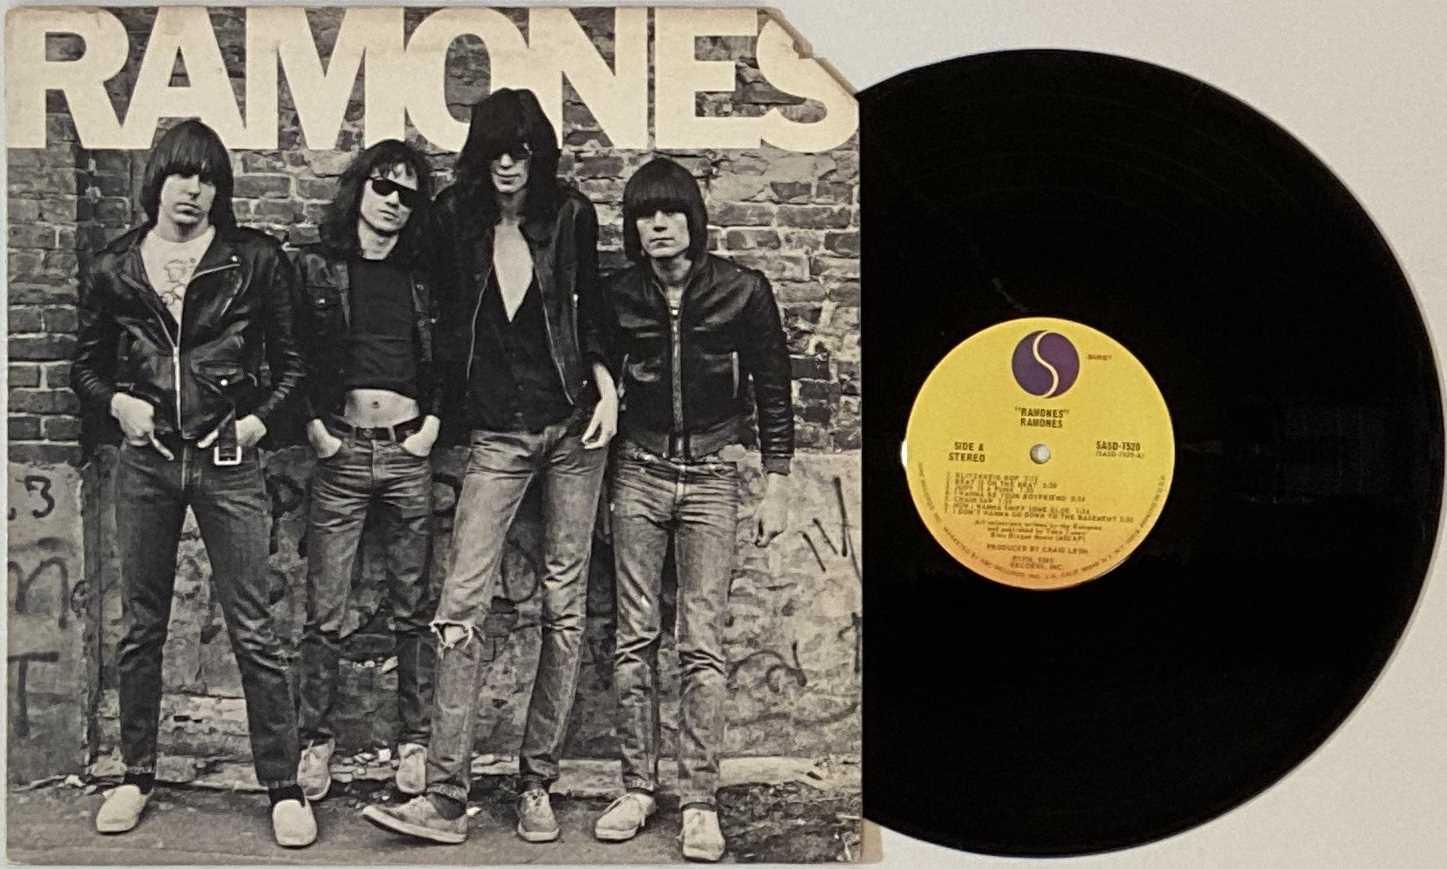 RAMONES - LPs - Image 3 of 5